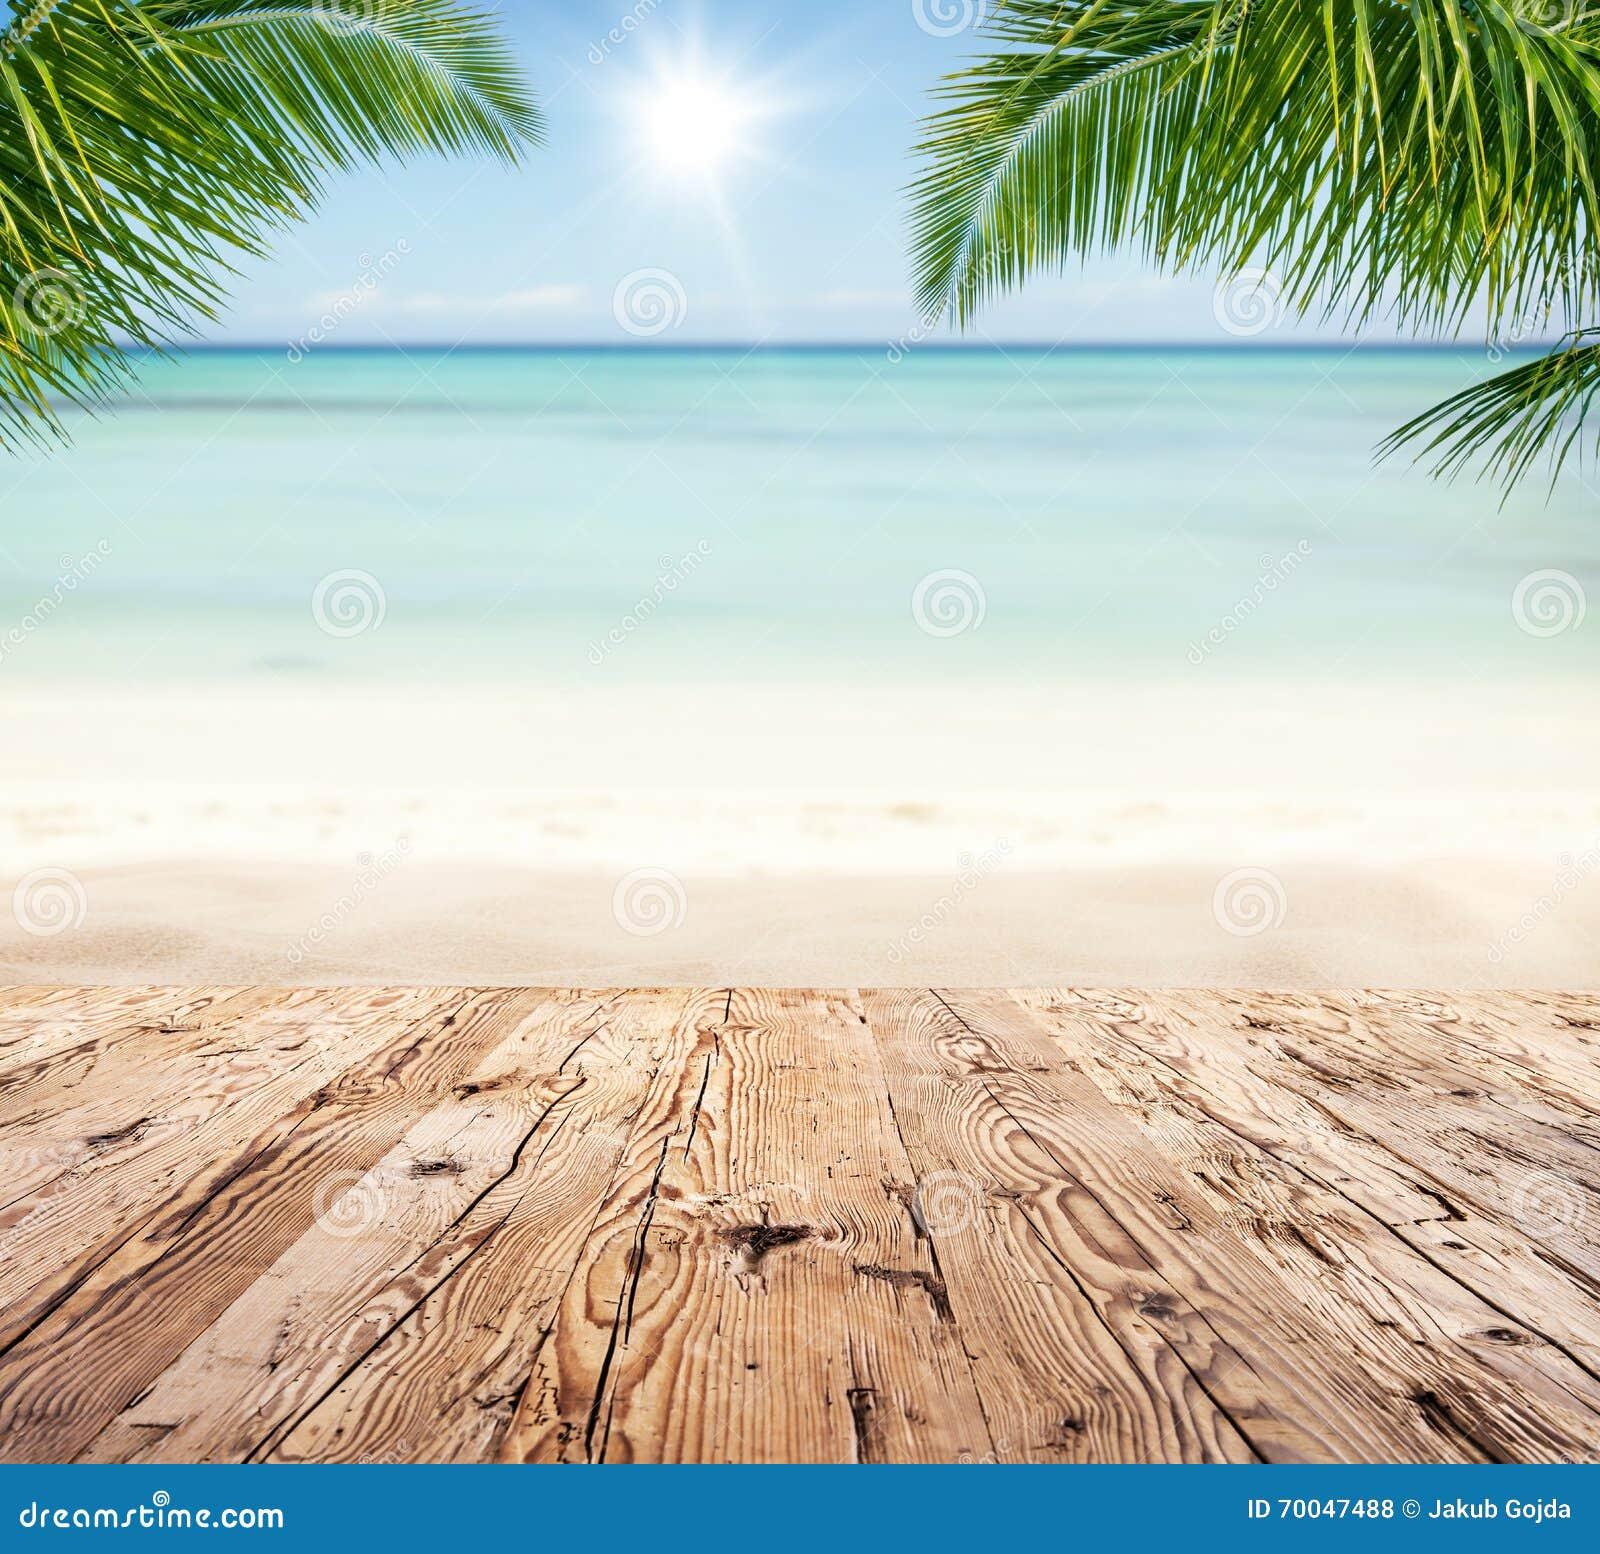 Vintage Beach Background Stock Photo 112981333: Empty Wooden Planks With Blur Beach On Background Stock